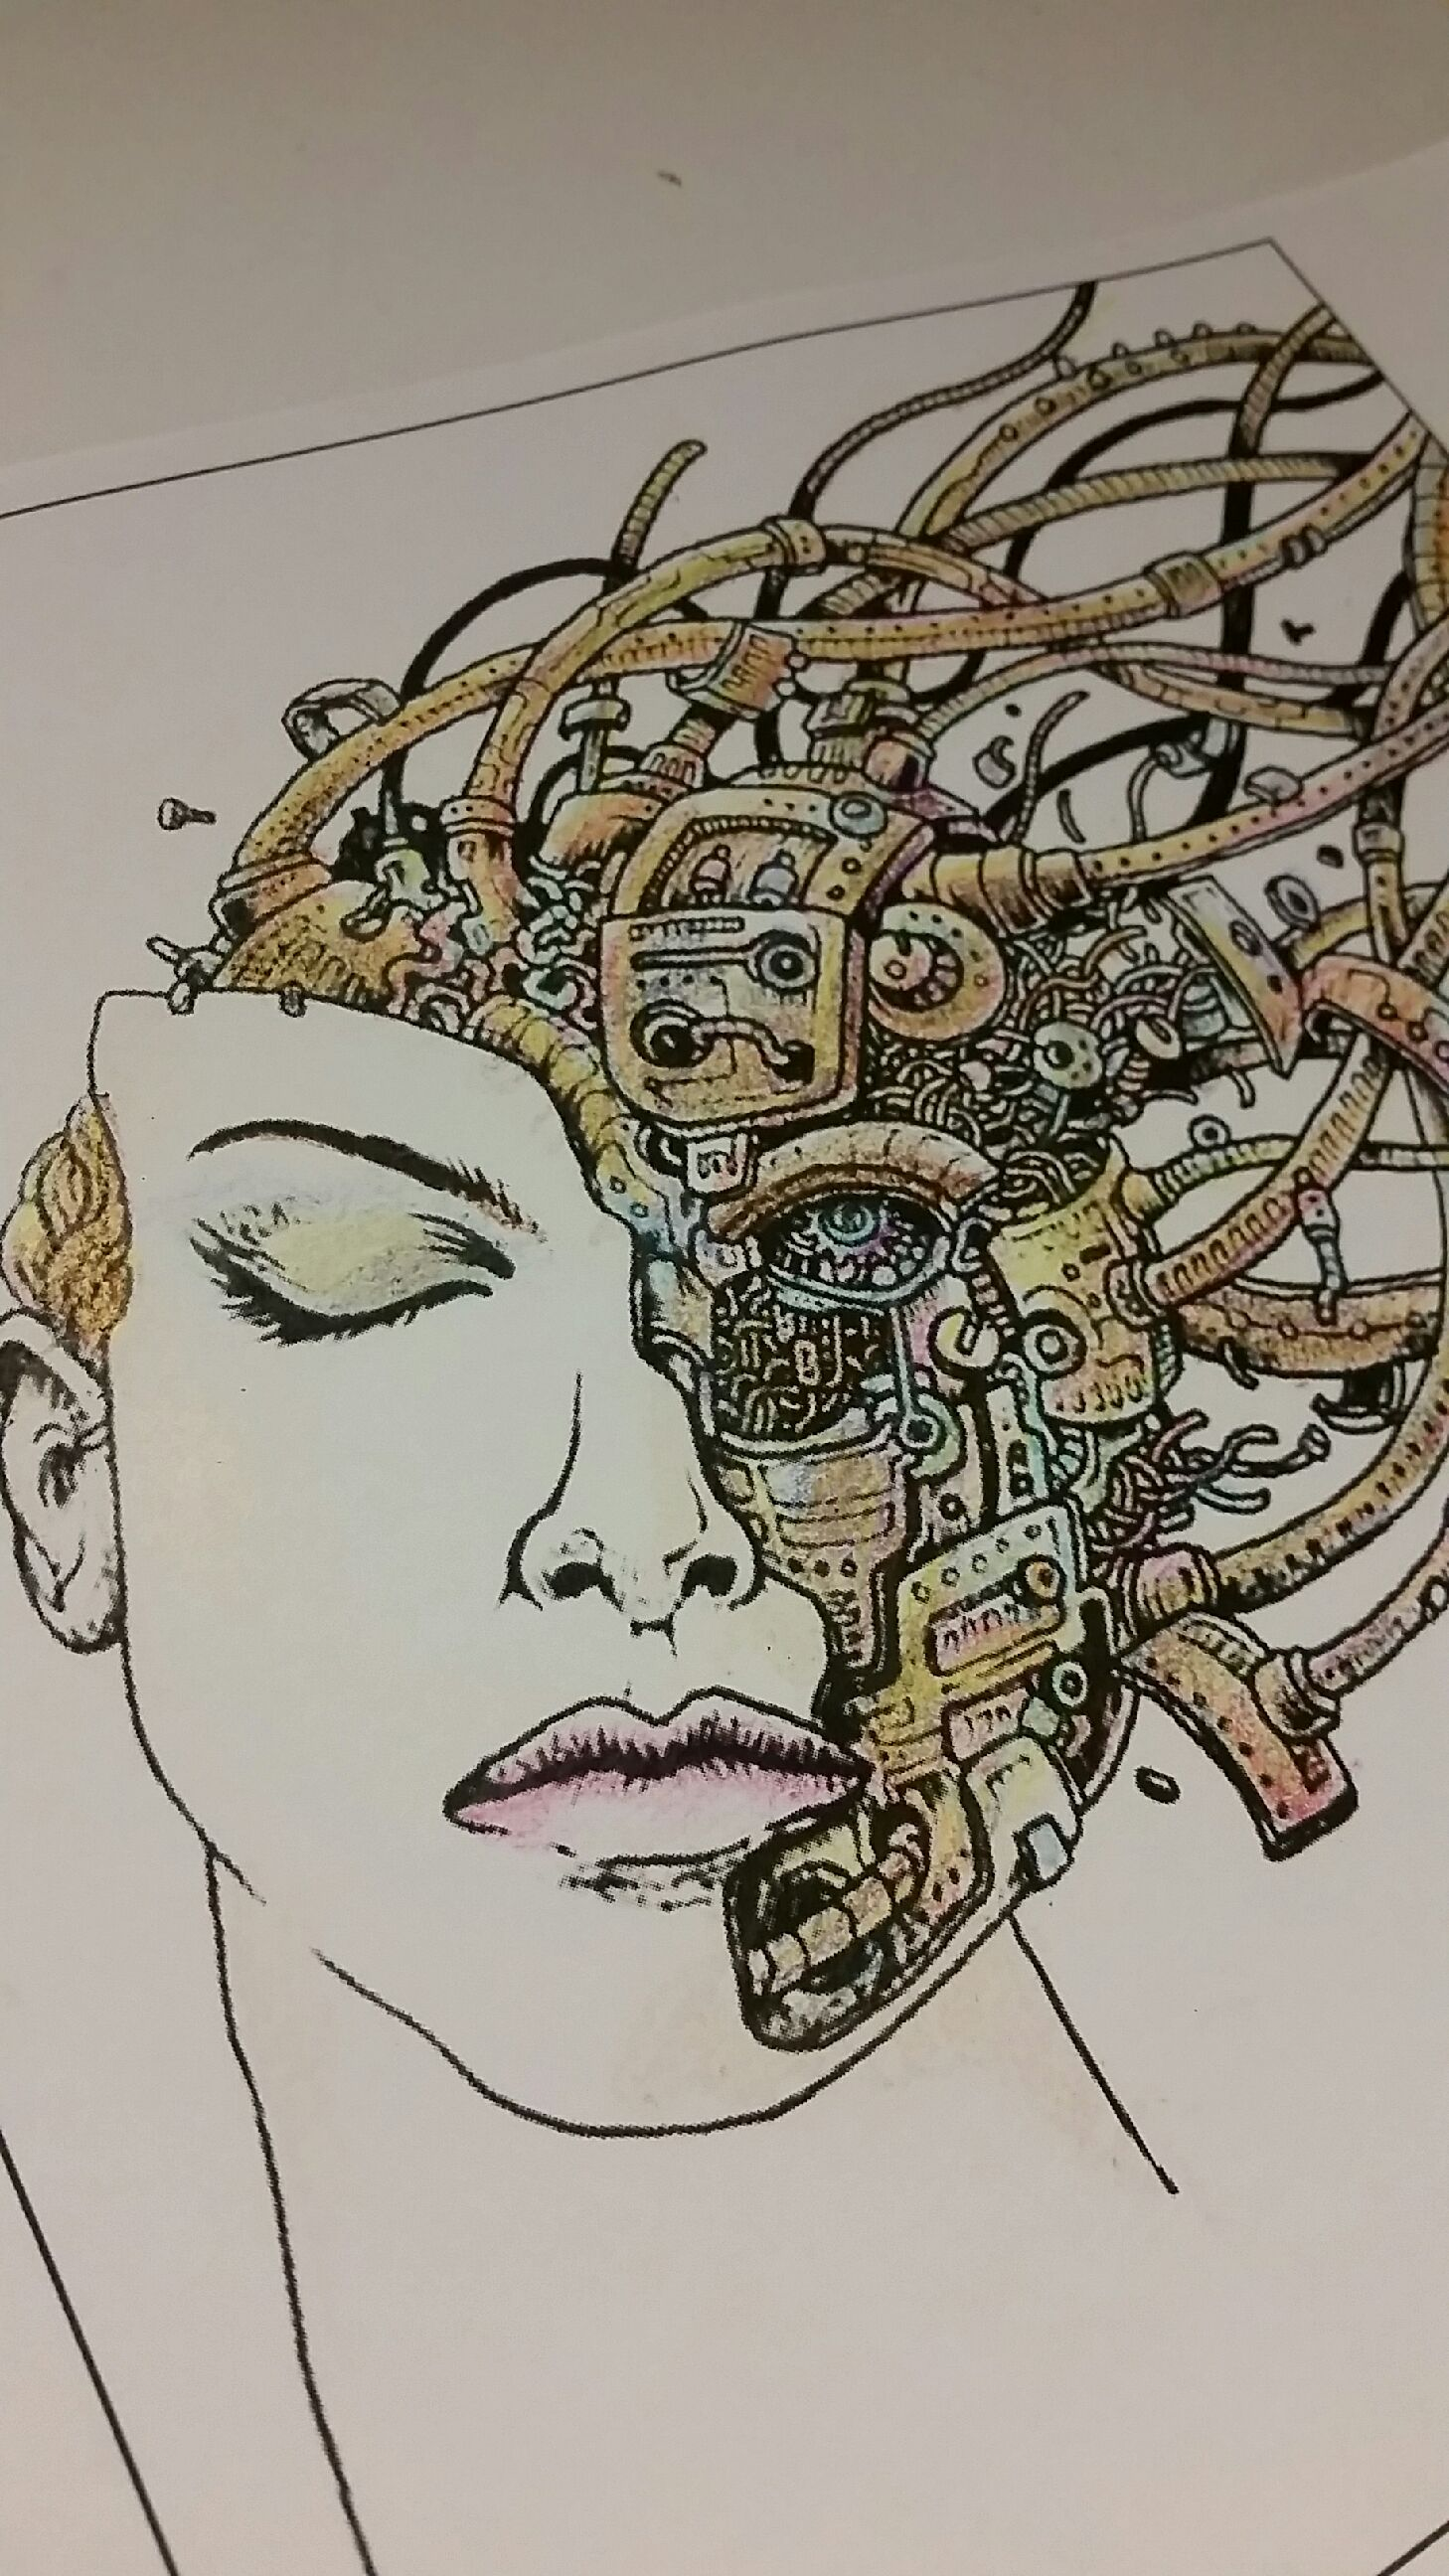 Crayola Crayon Drawing : crayola, crayon, drawing, Colored, Using, Standard, Crayola, Crayons., Drawing, Kerby, Rosanes, Coloring